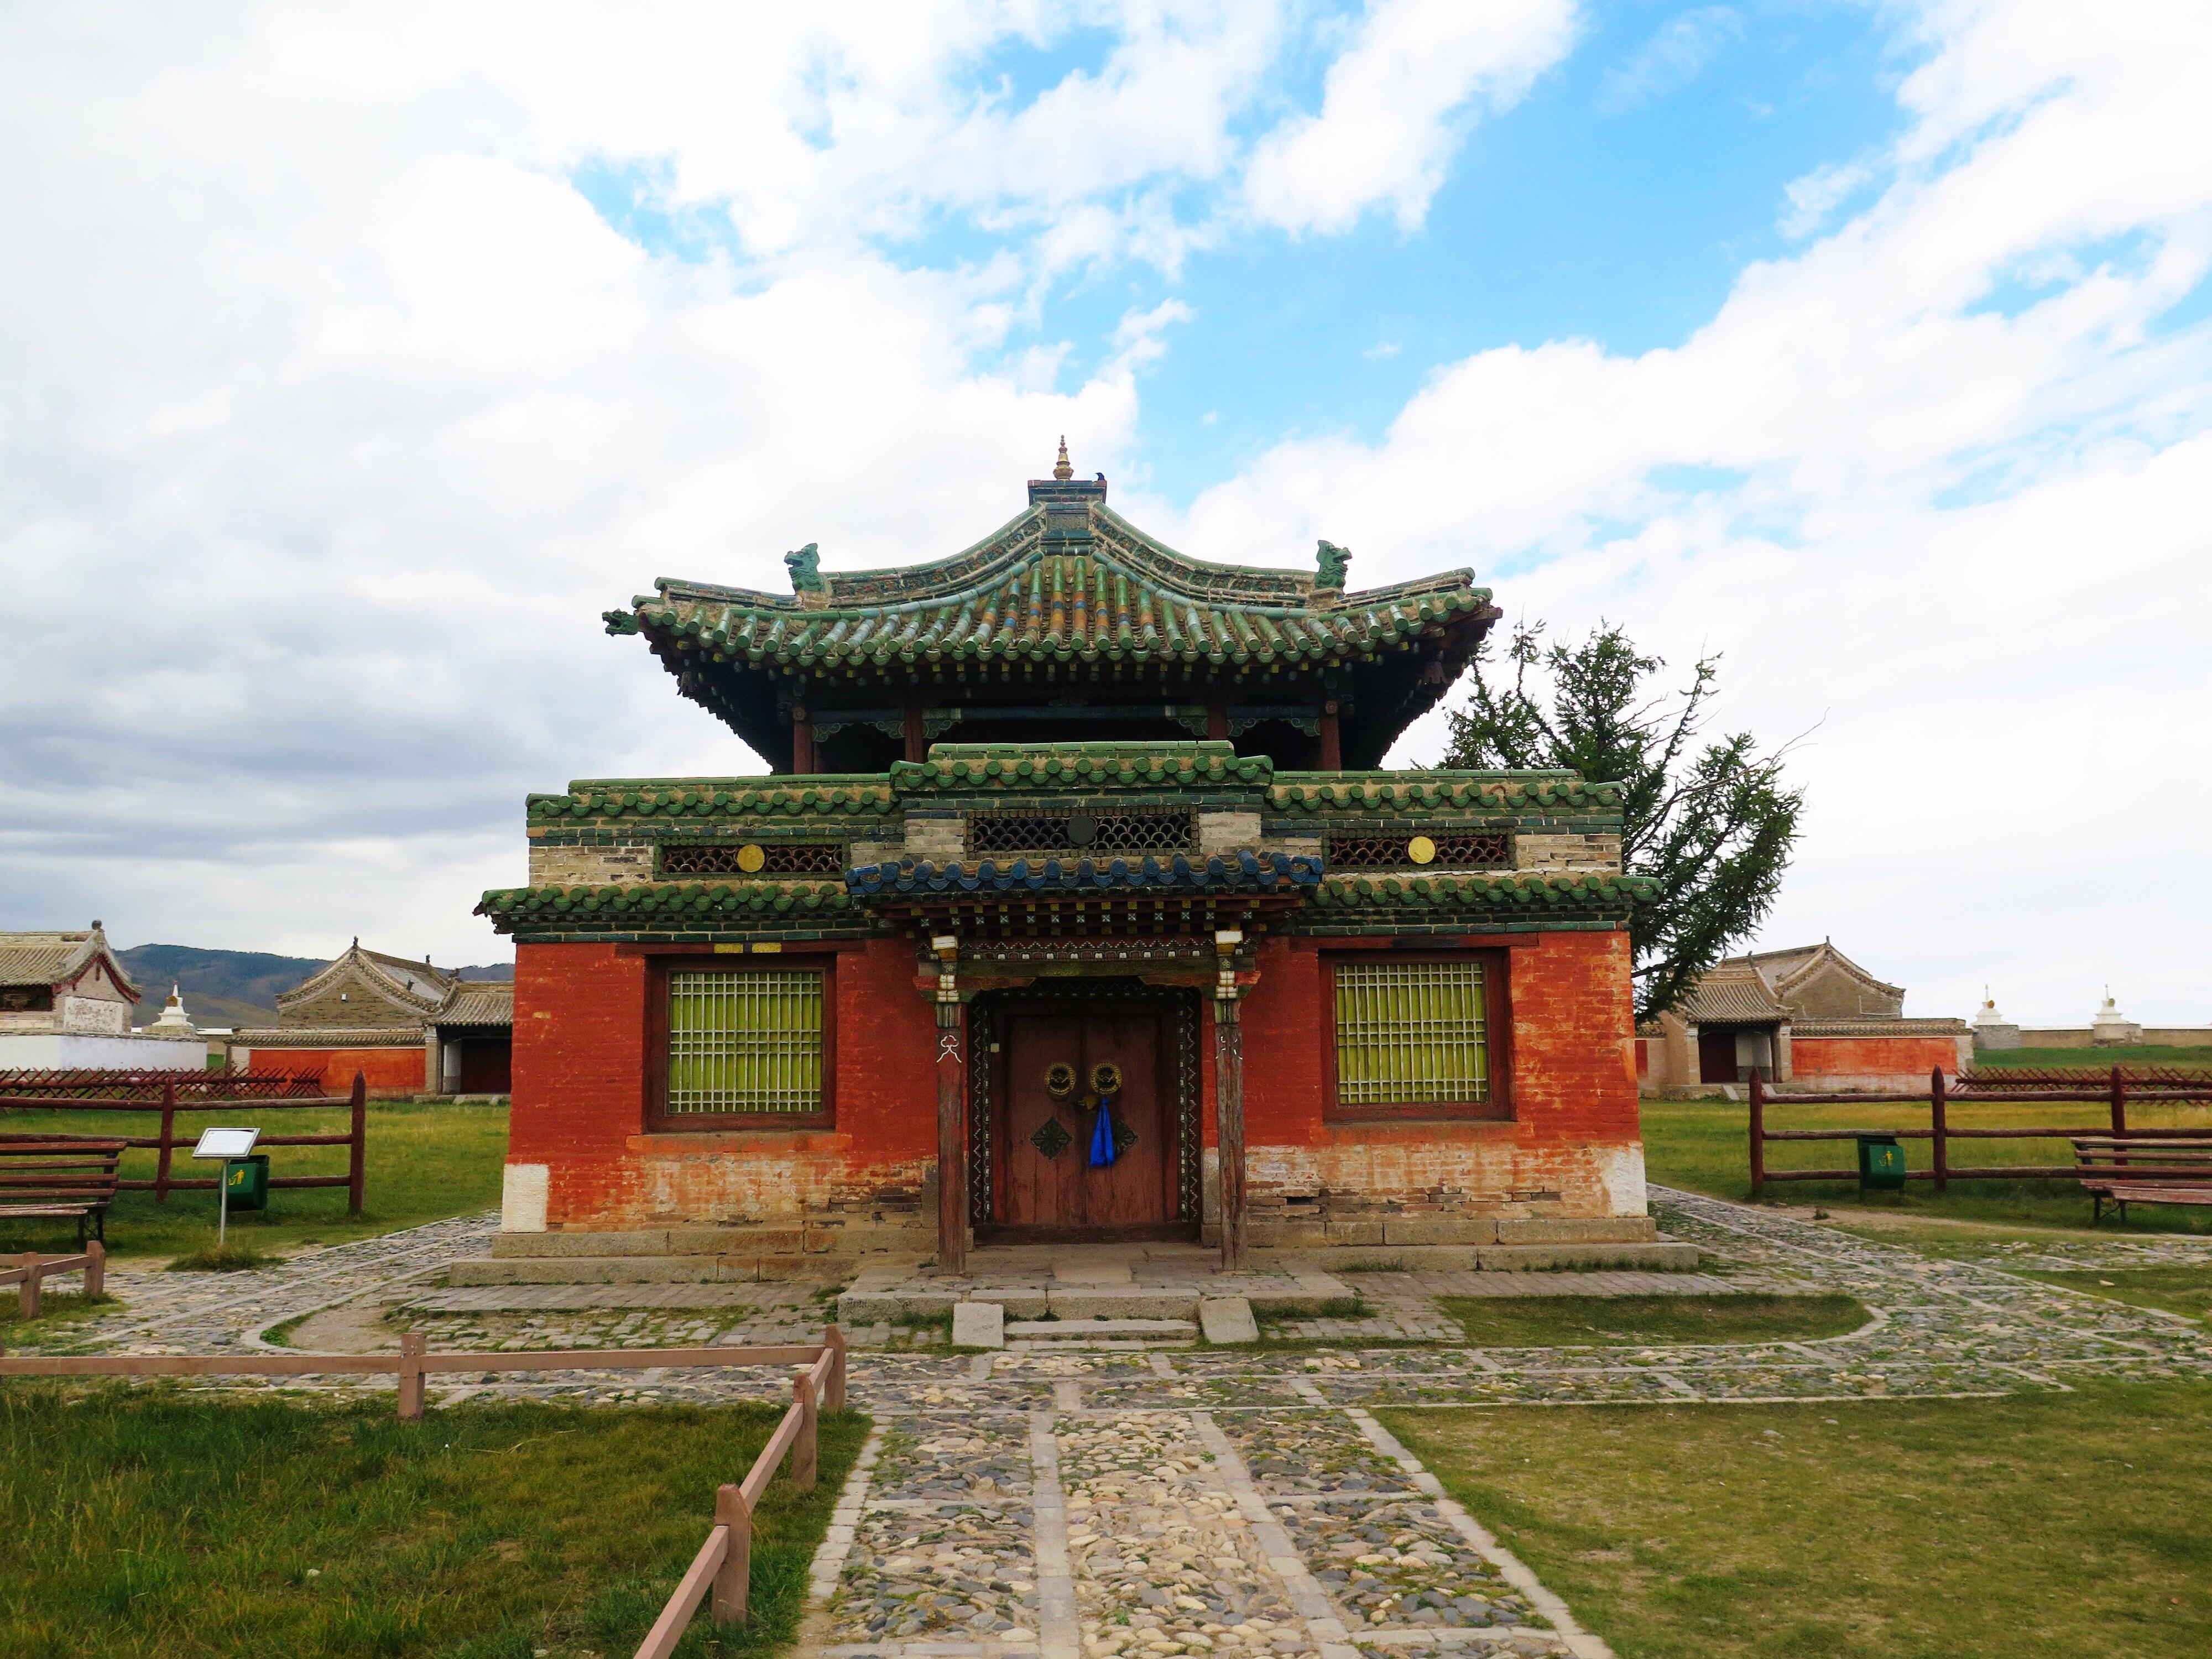 Erdene Zuu, inside the complex.